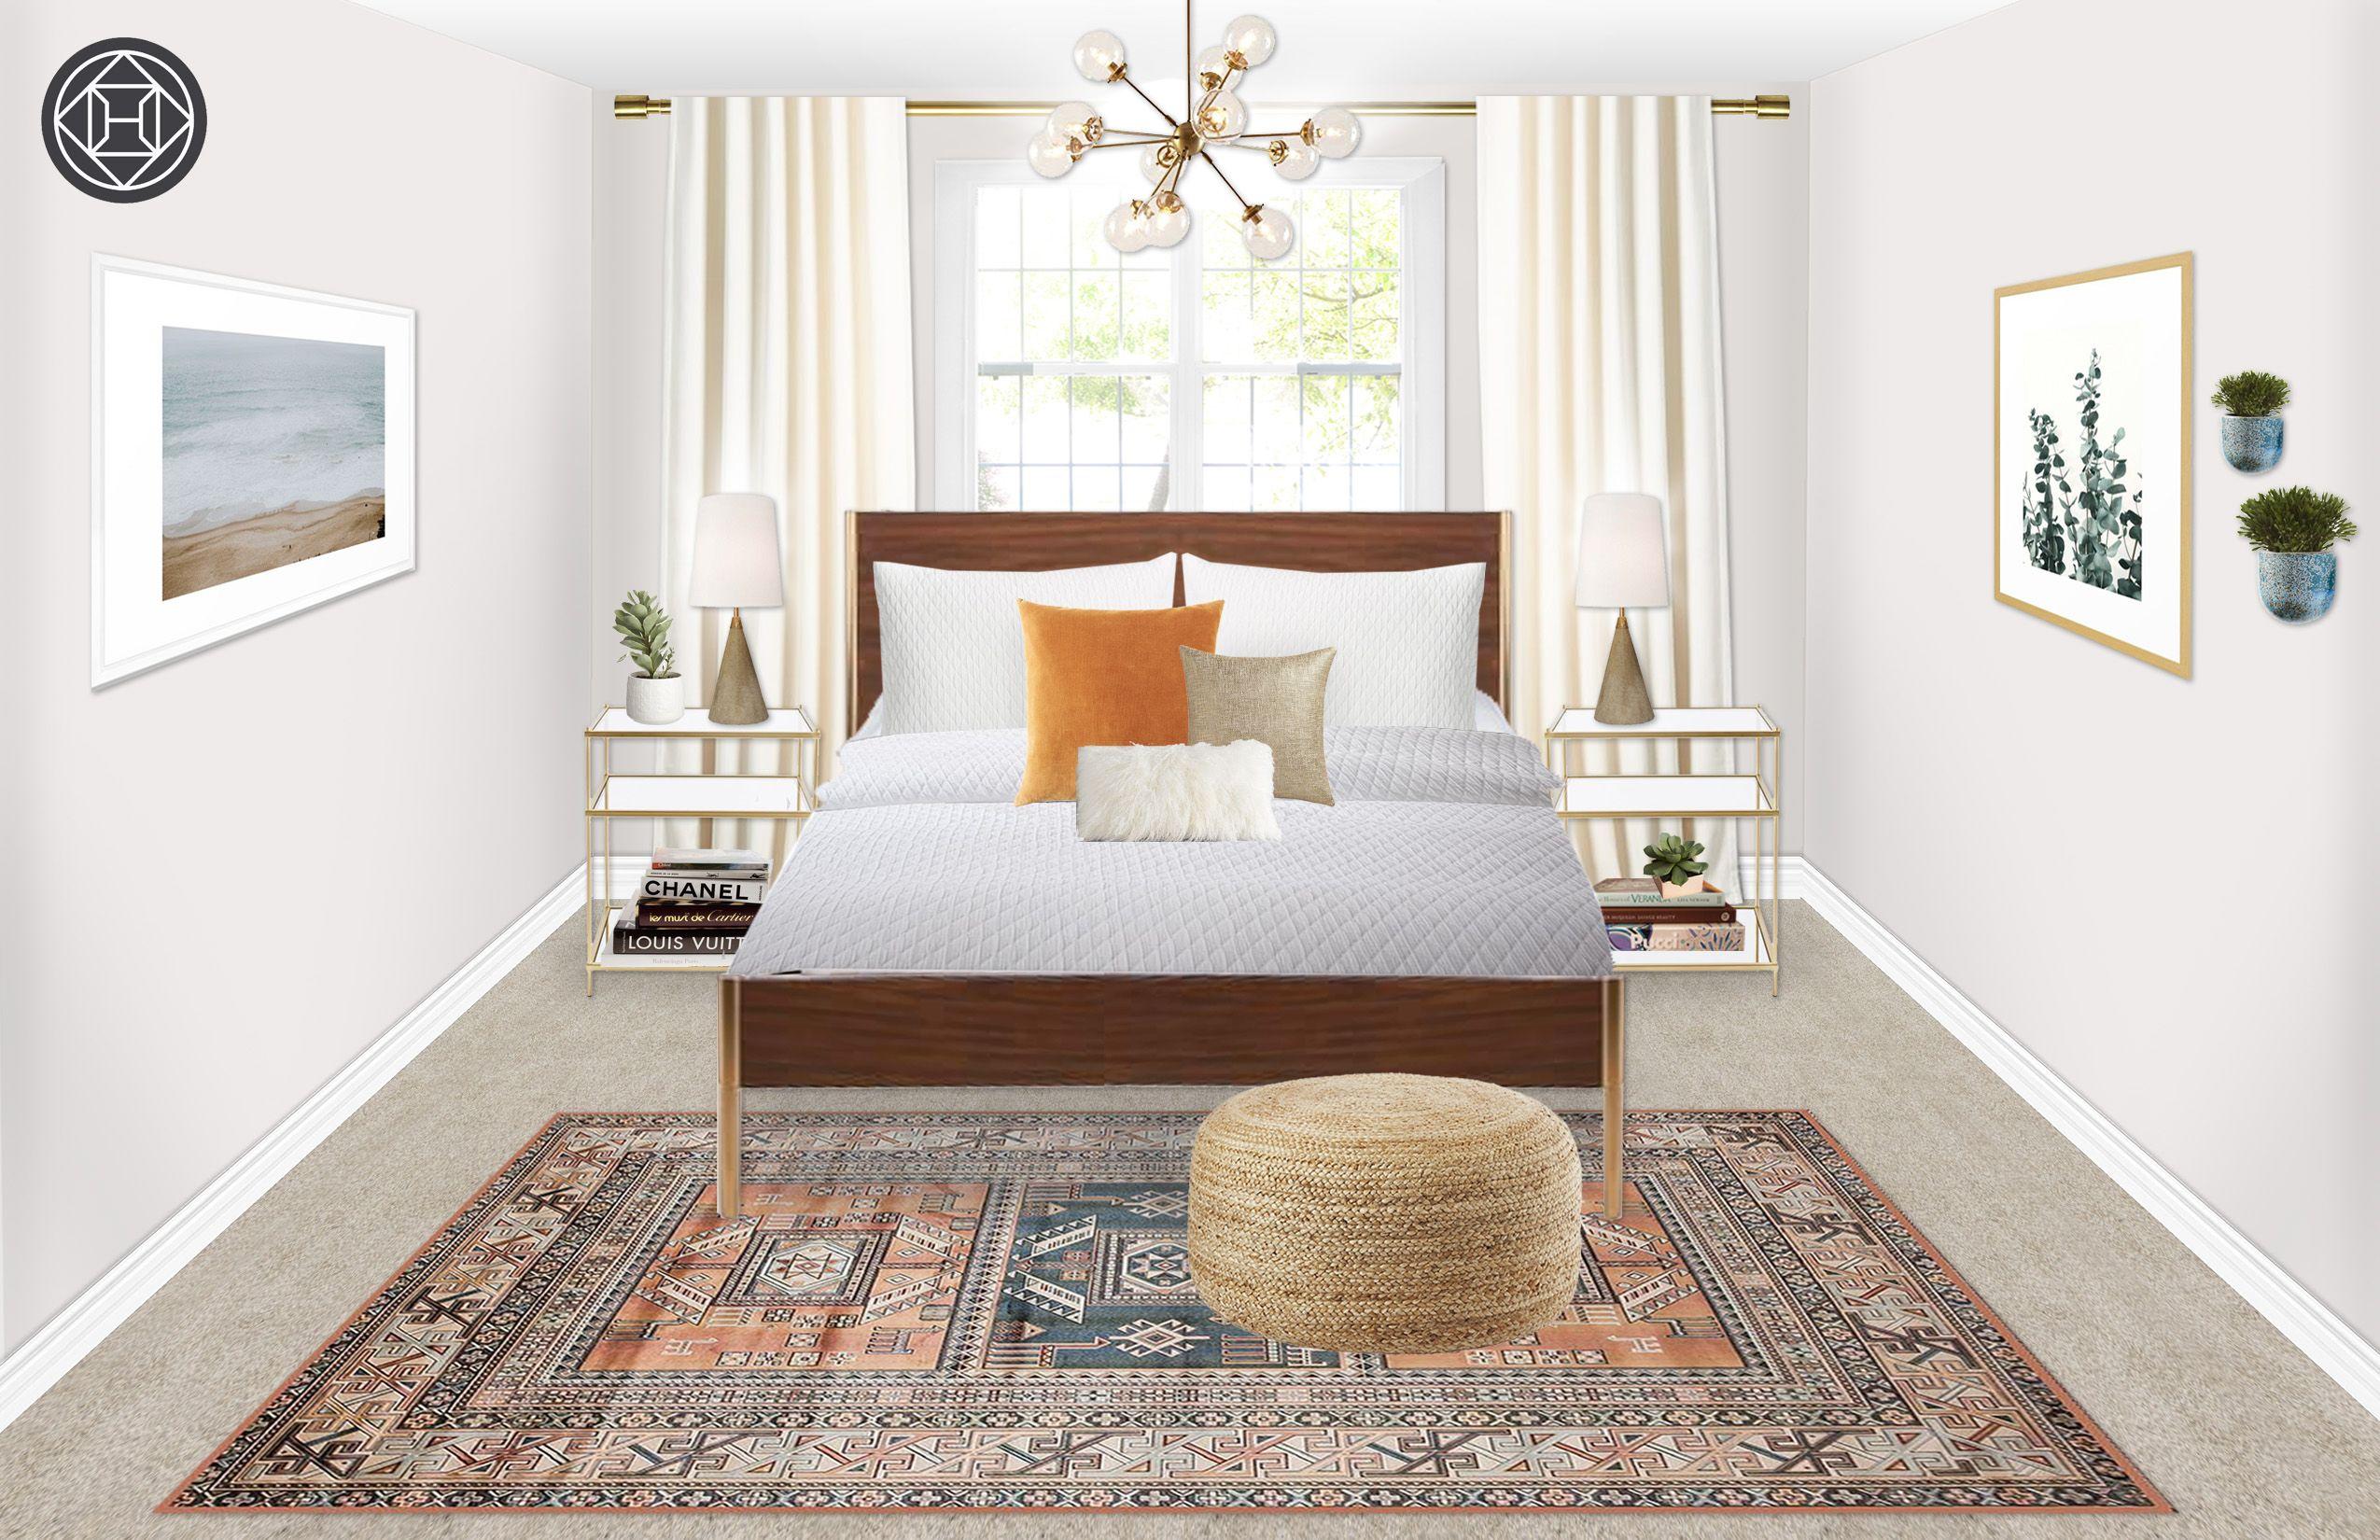 Contemporary Eclectic Bohemian Midcentury Modern Bedroom Design By Havenly Interior Designer Robyn Mid Century Modern Bedroom Design Eclectic Bedroom Mid Century Modern Bedroom